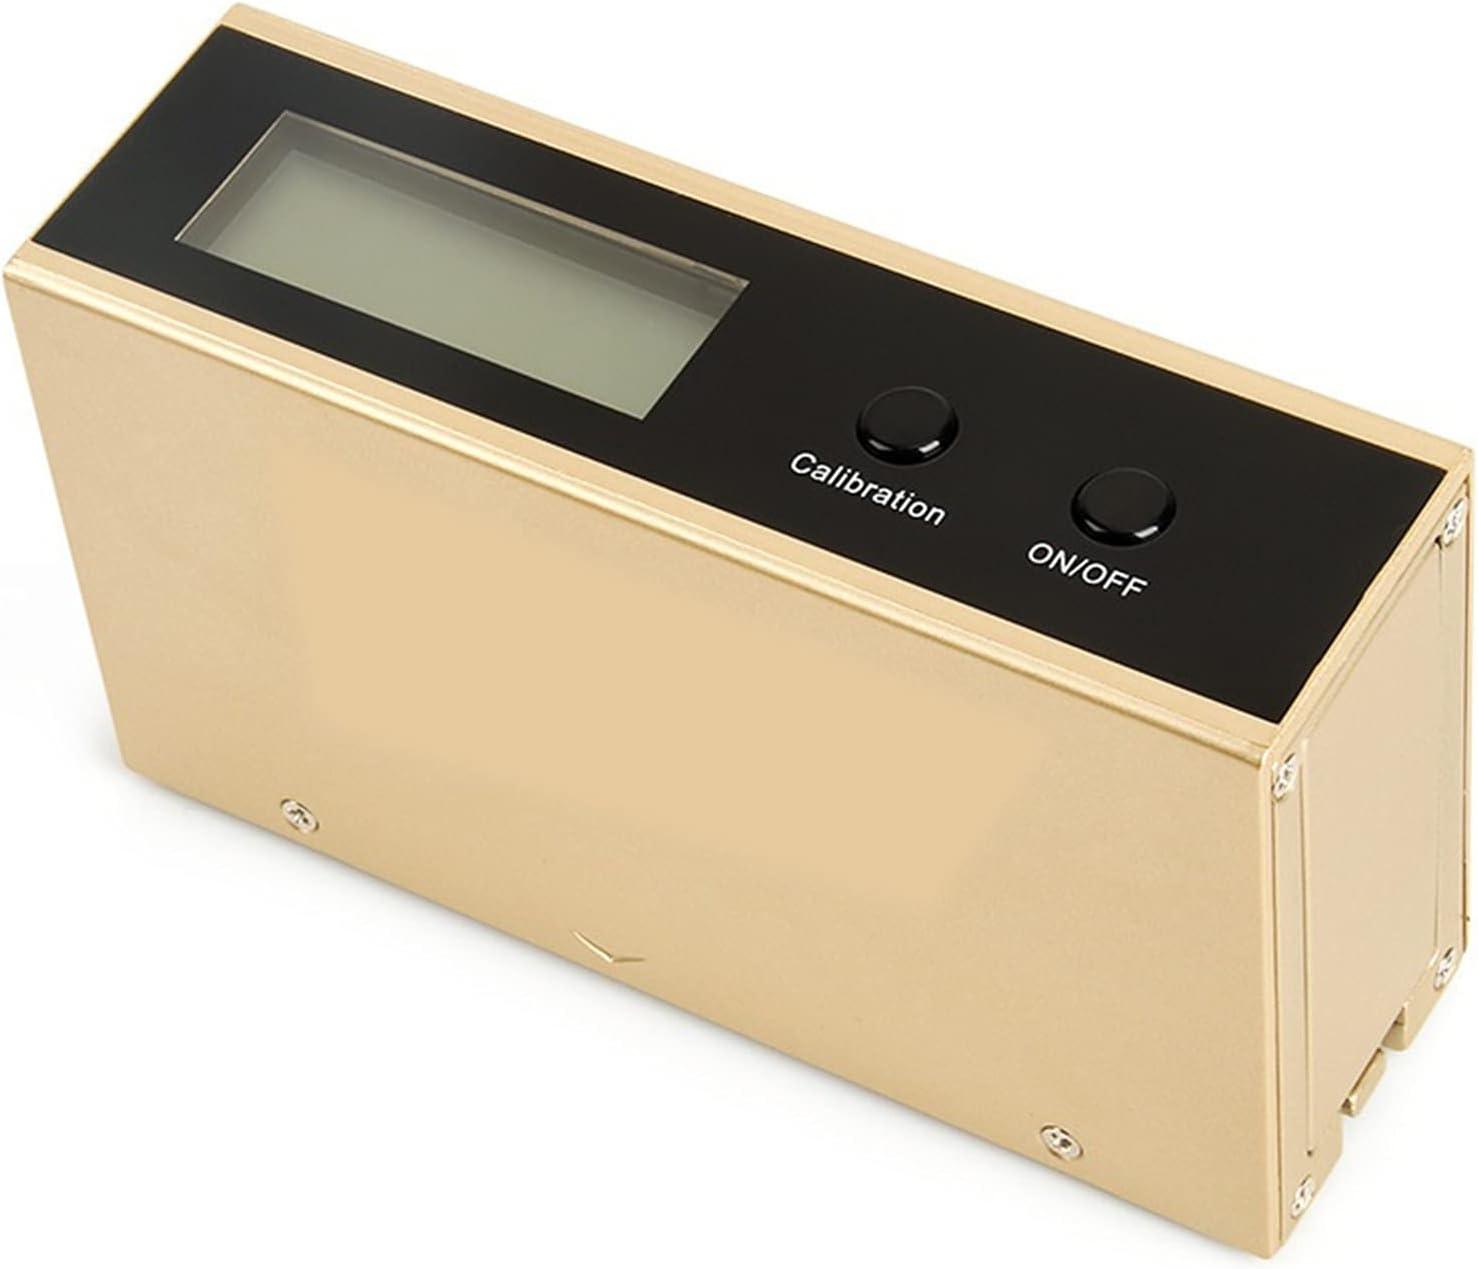 Surprise price HAILAN-H Color Analyzer Gloss Challenge the lowest price of Japan Meter Stone Cera Metal Light